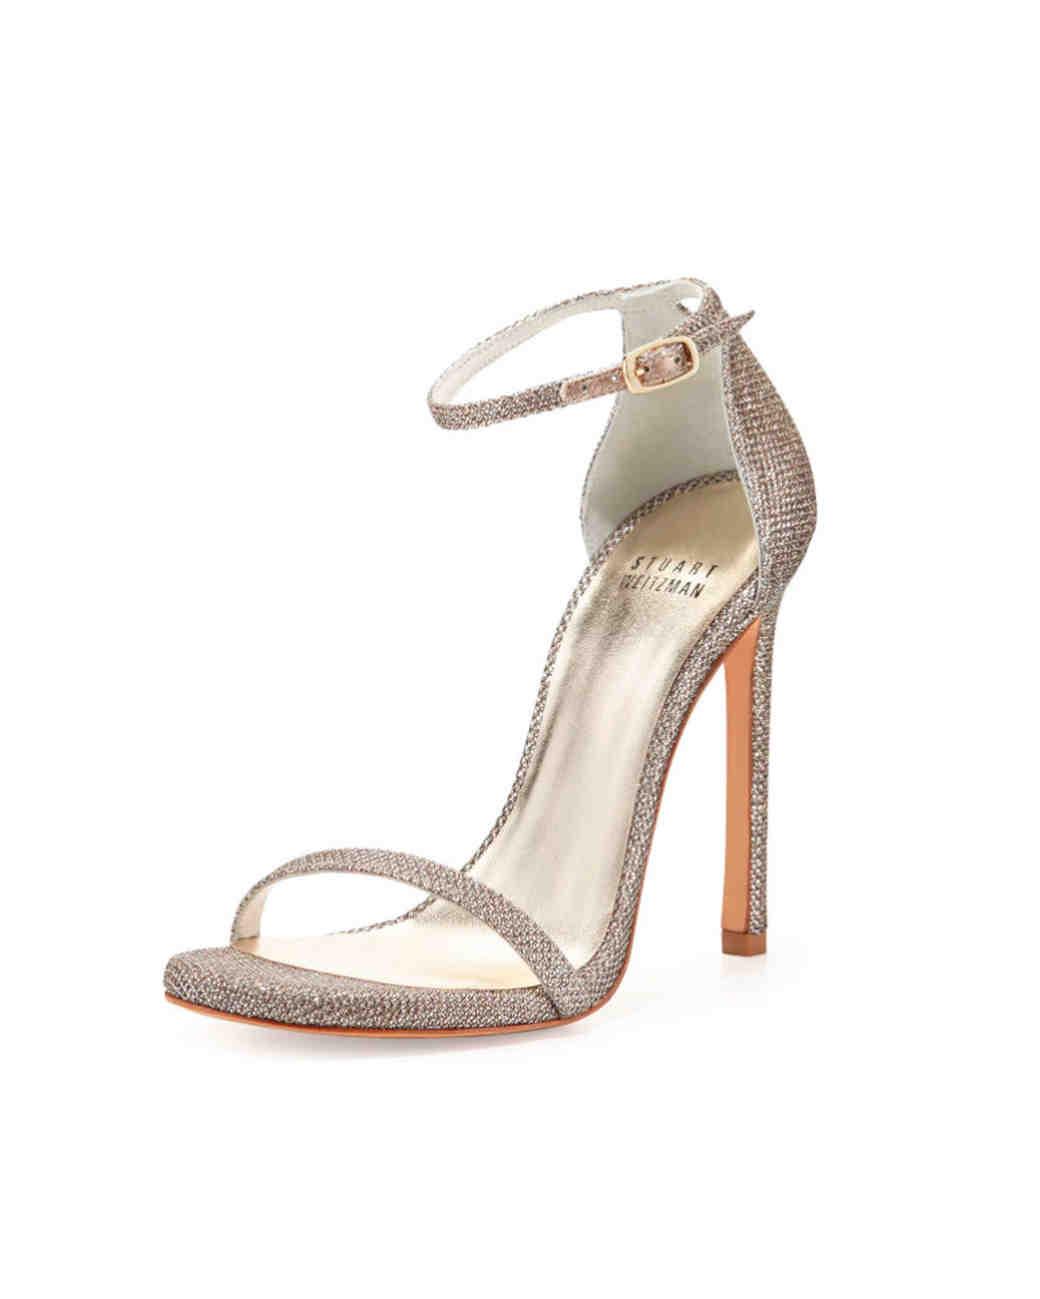 platinum anniversary gifts nudist heels stuart weitzman